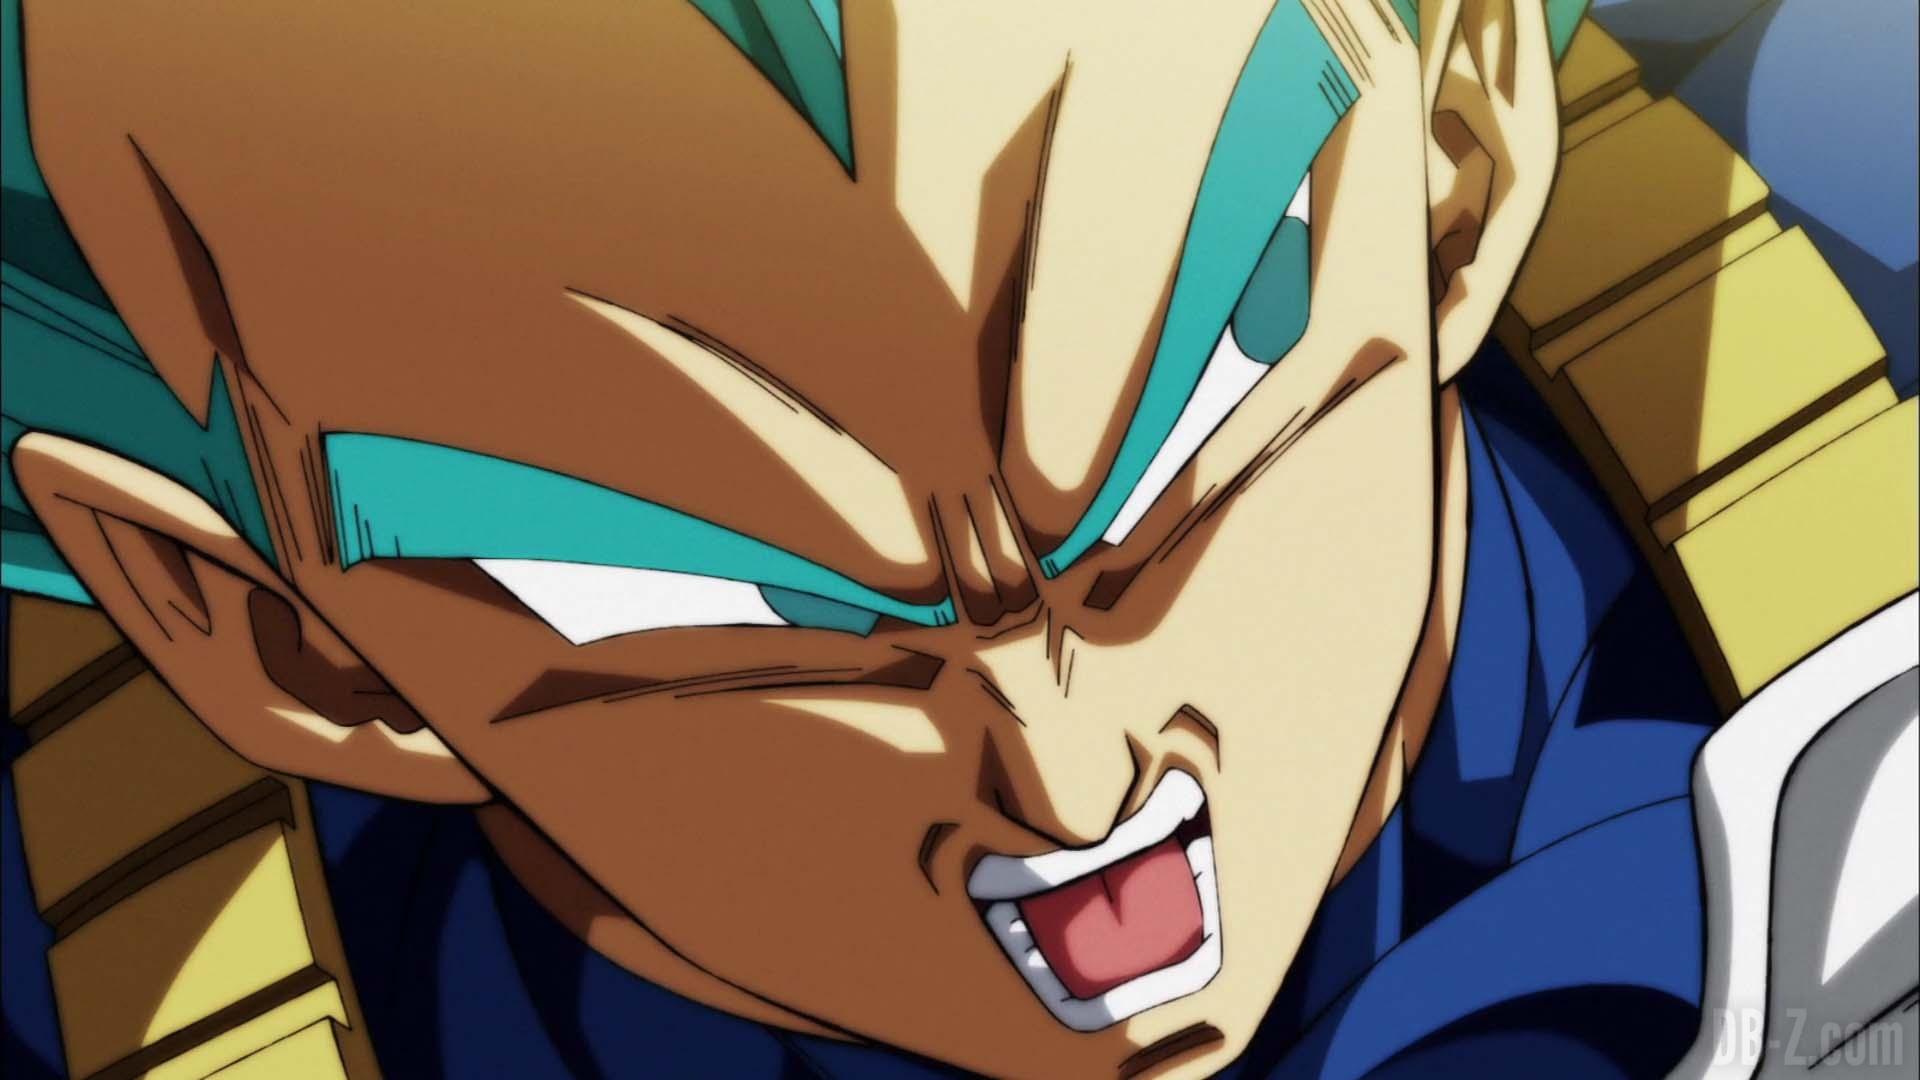 Goku Dragon ball super ULTRA INSTINCT DBS Case For iPhone